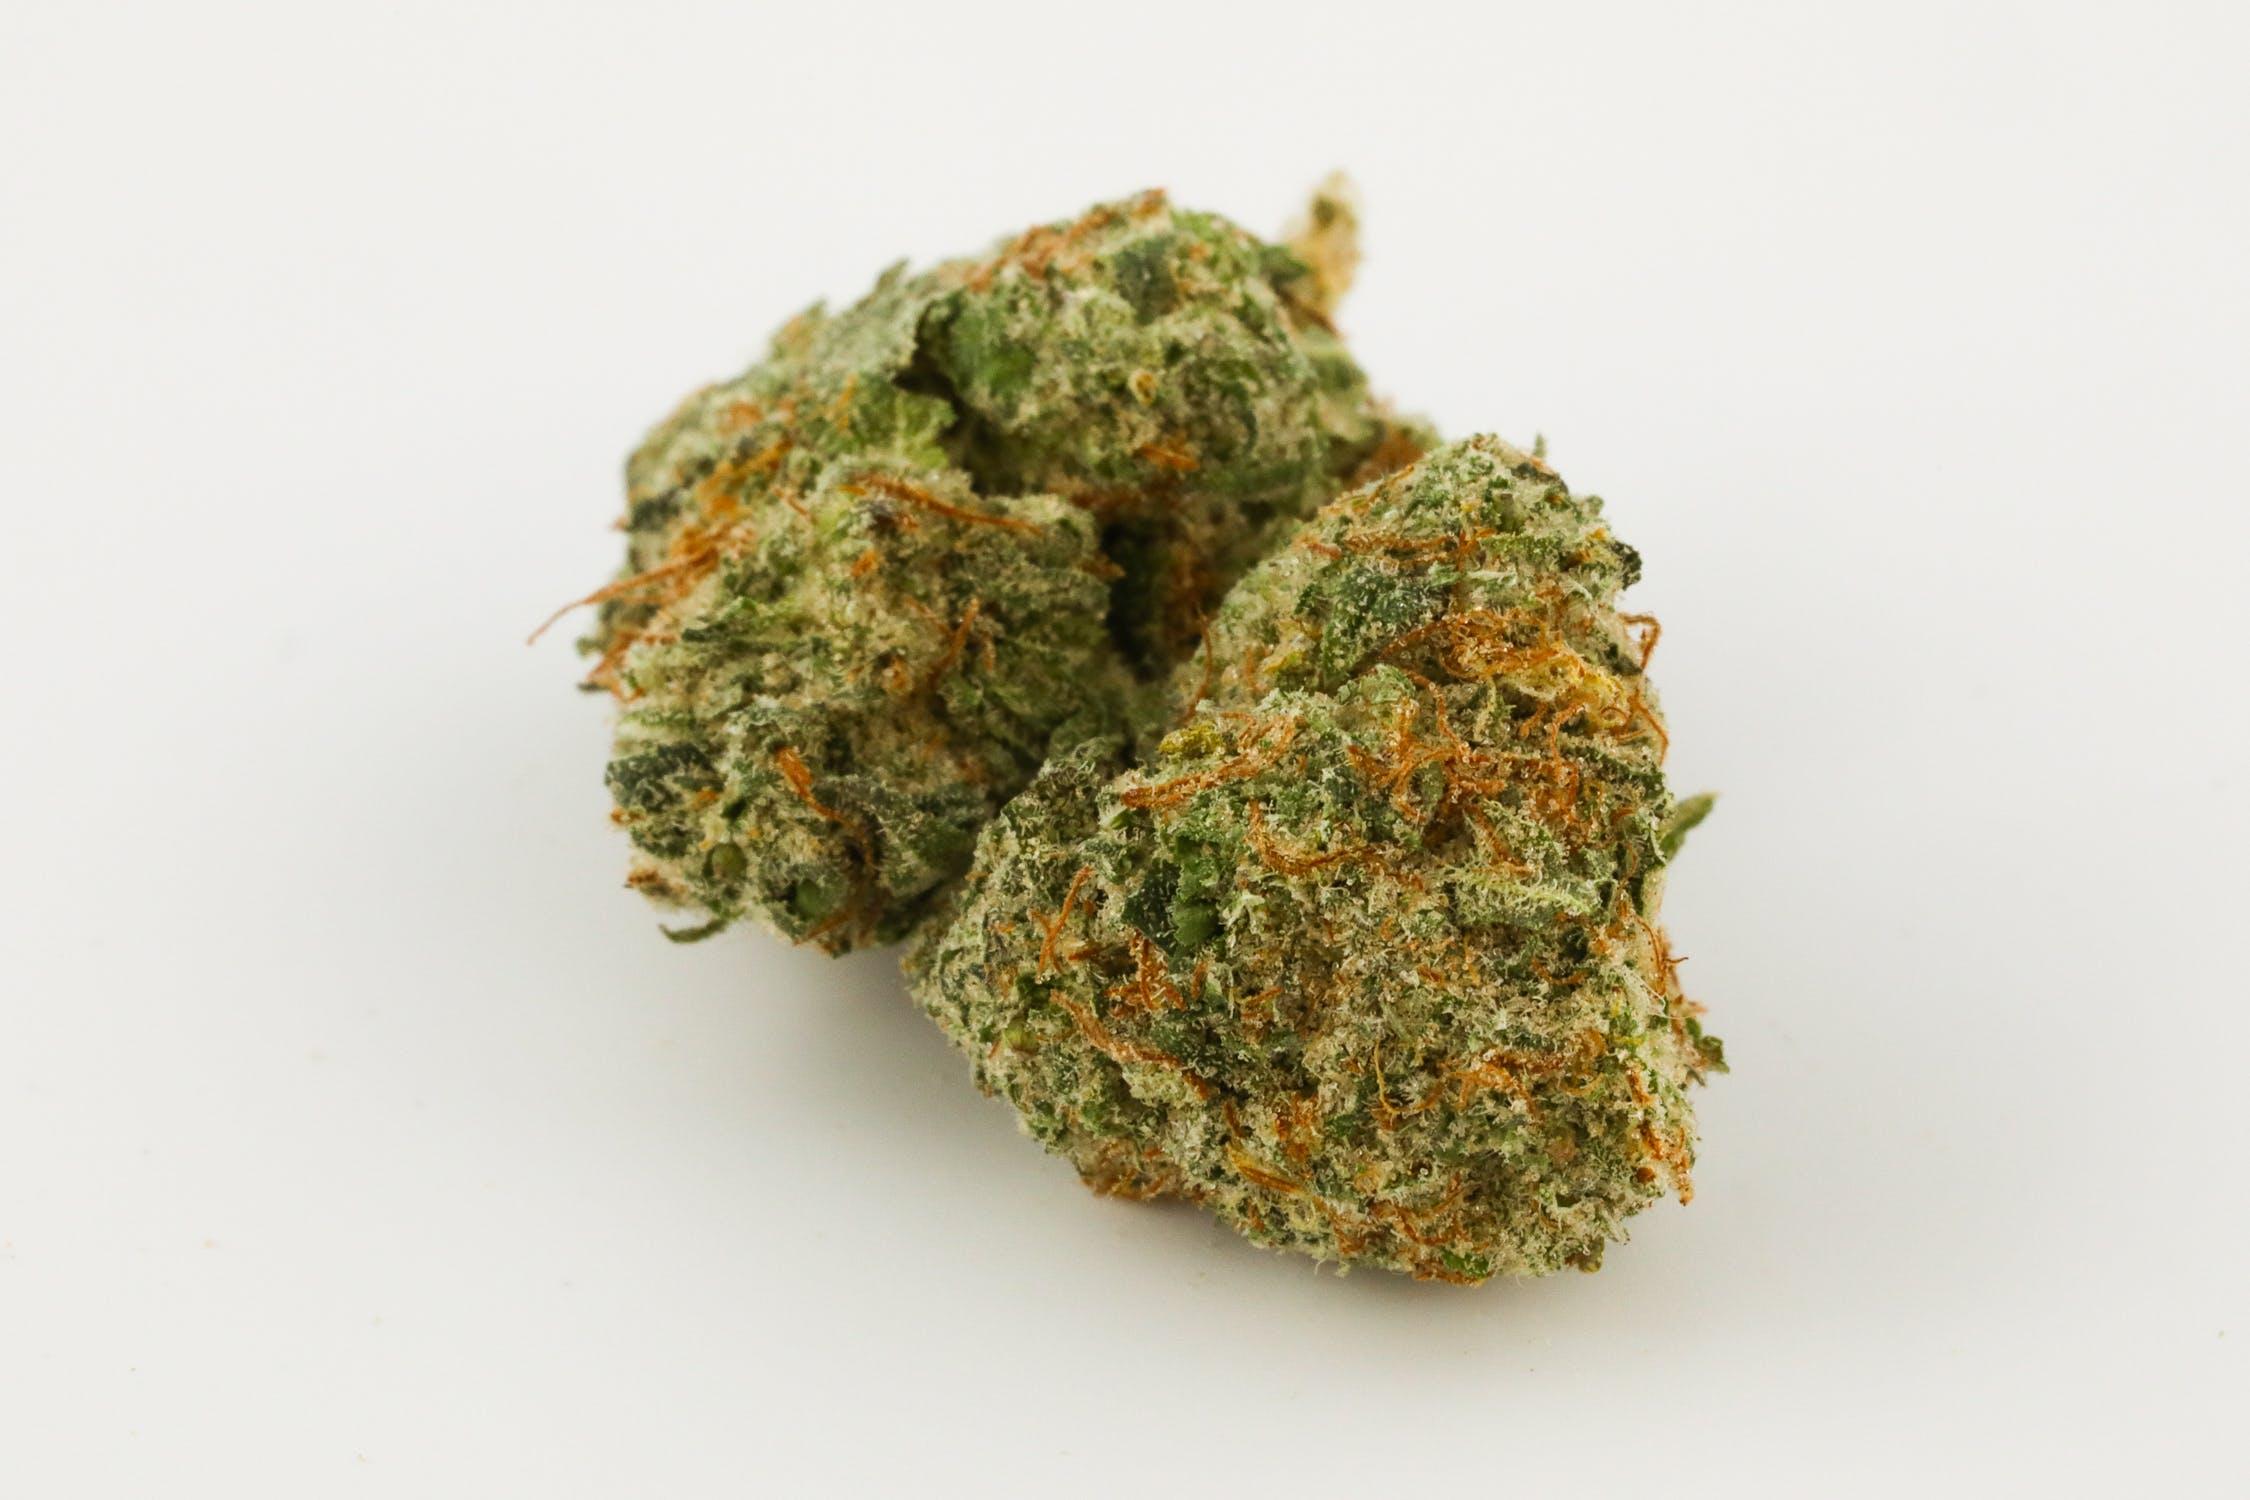 G-13 Haze Weed; G-13 Haze Cannabis Strain; G-13 Haze Hybrid Marijuana Strain